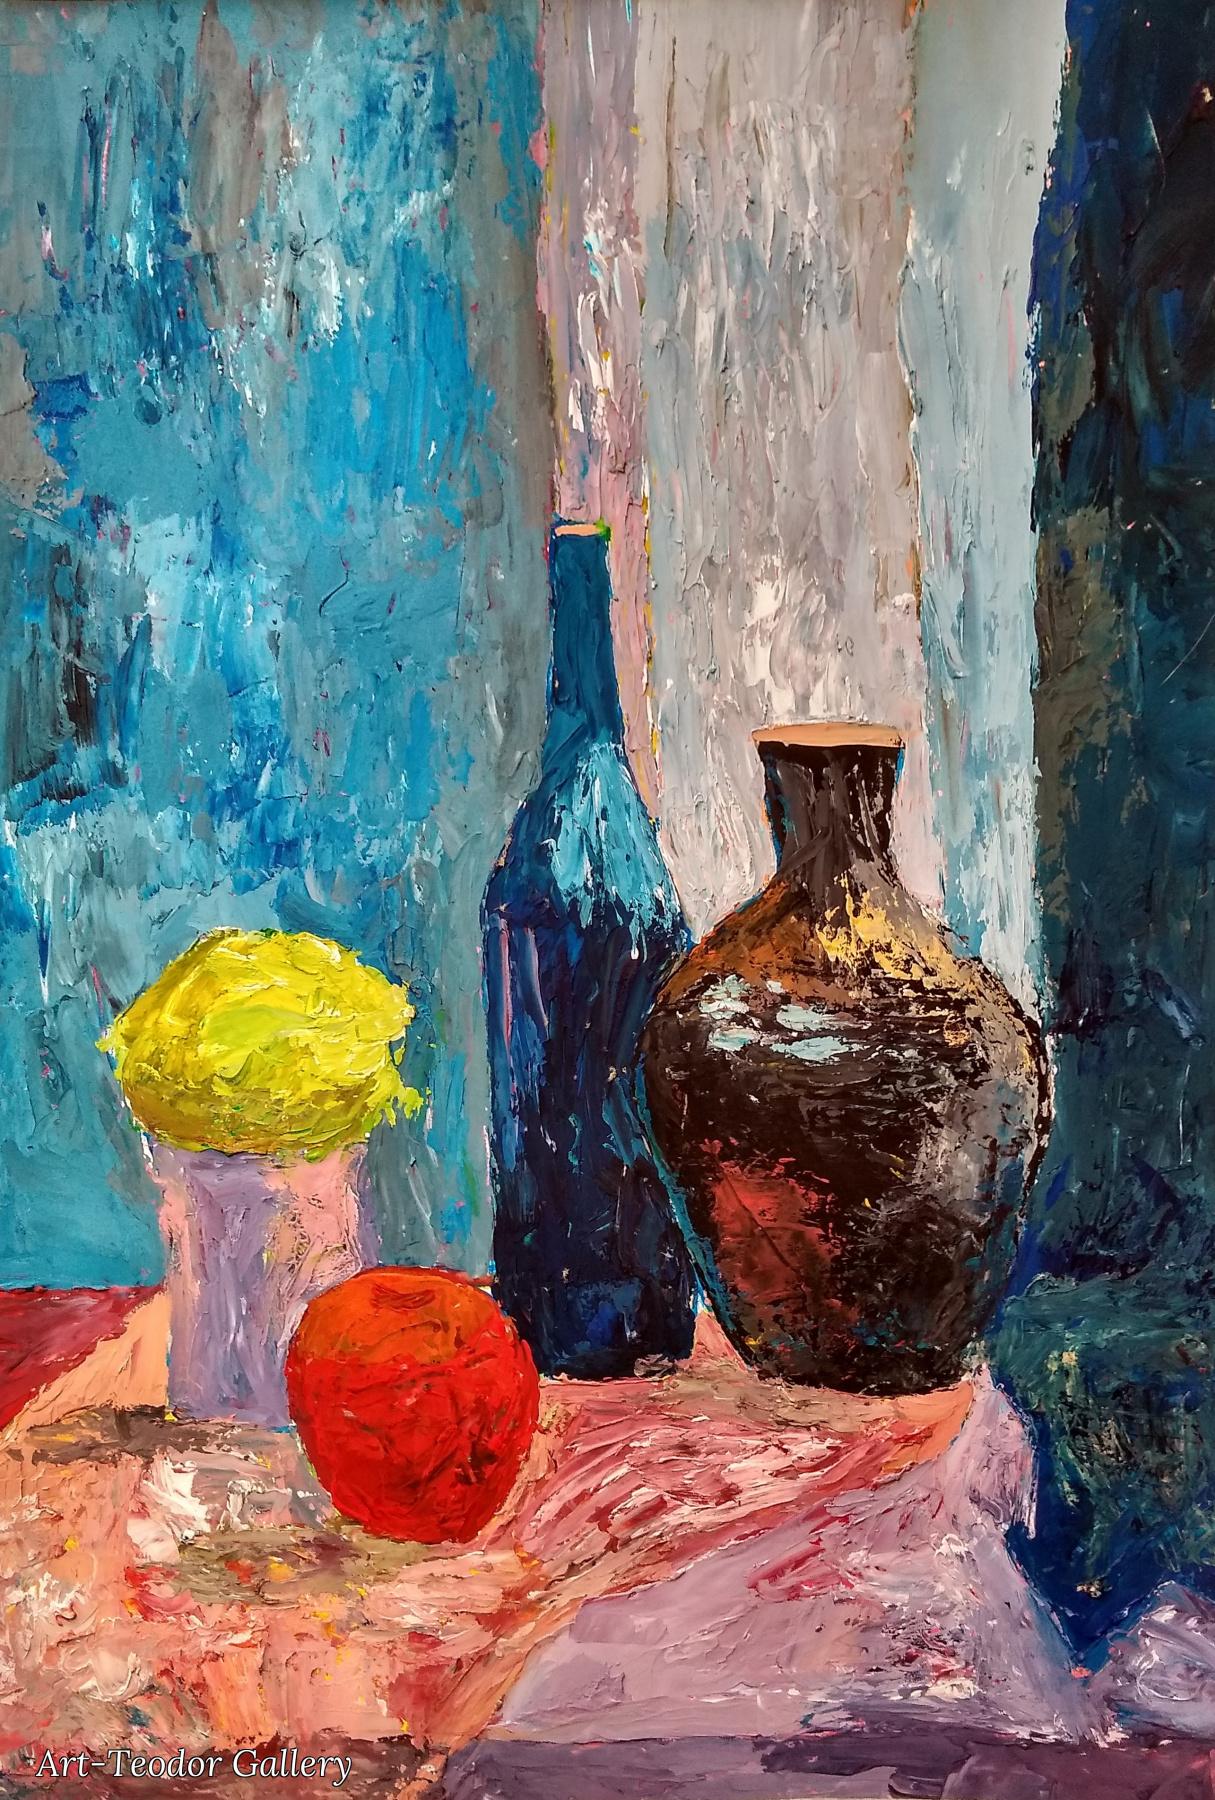 Art-Teodor Gallery. Сонет